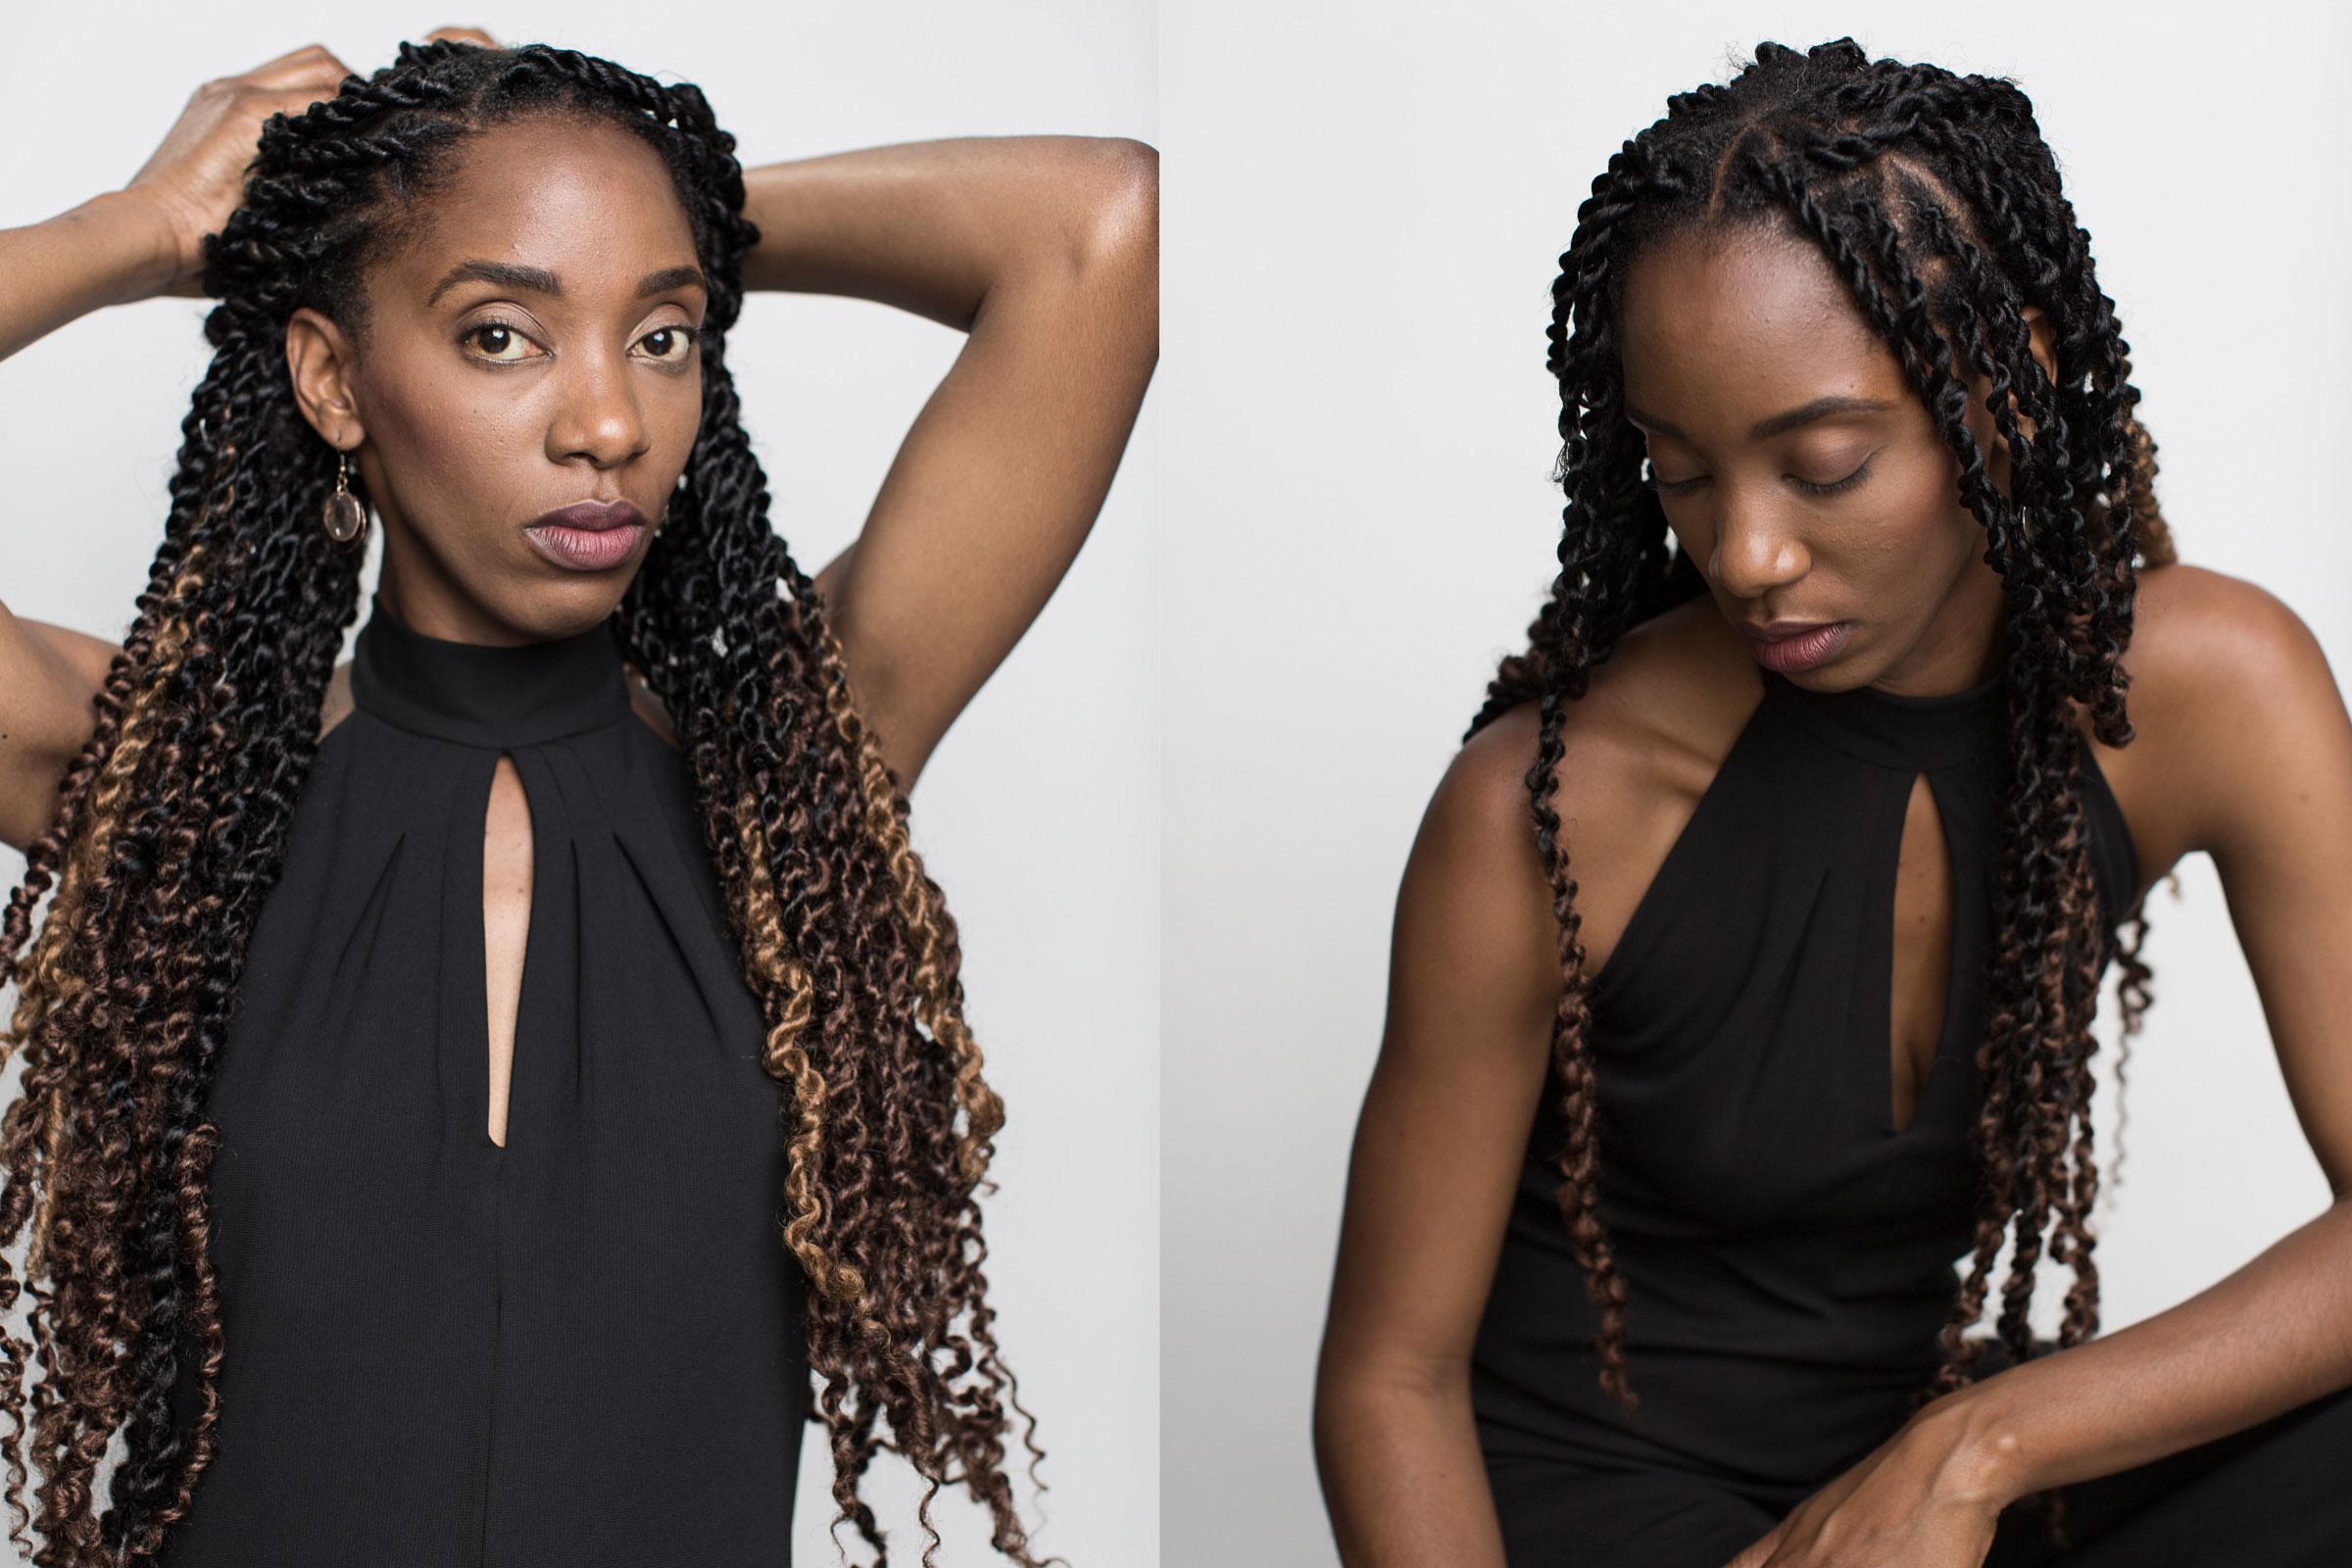 Fashion-portrait-young-woman-dark-skin